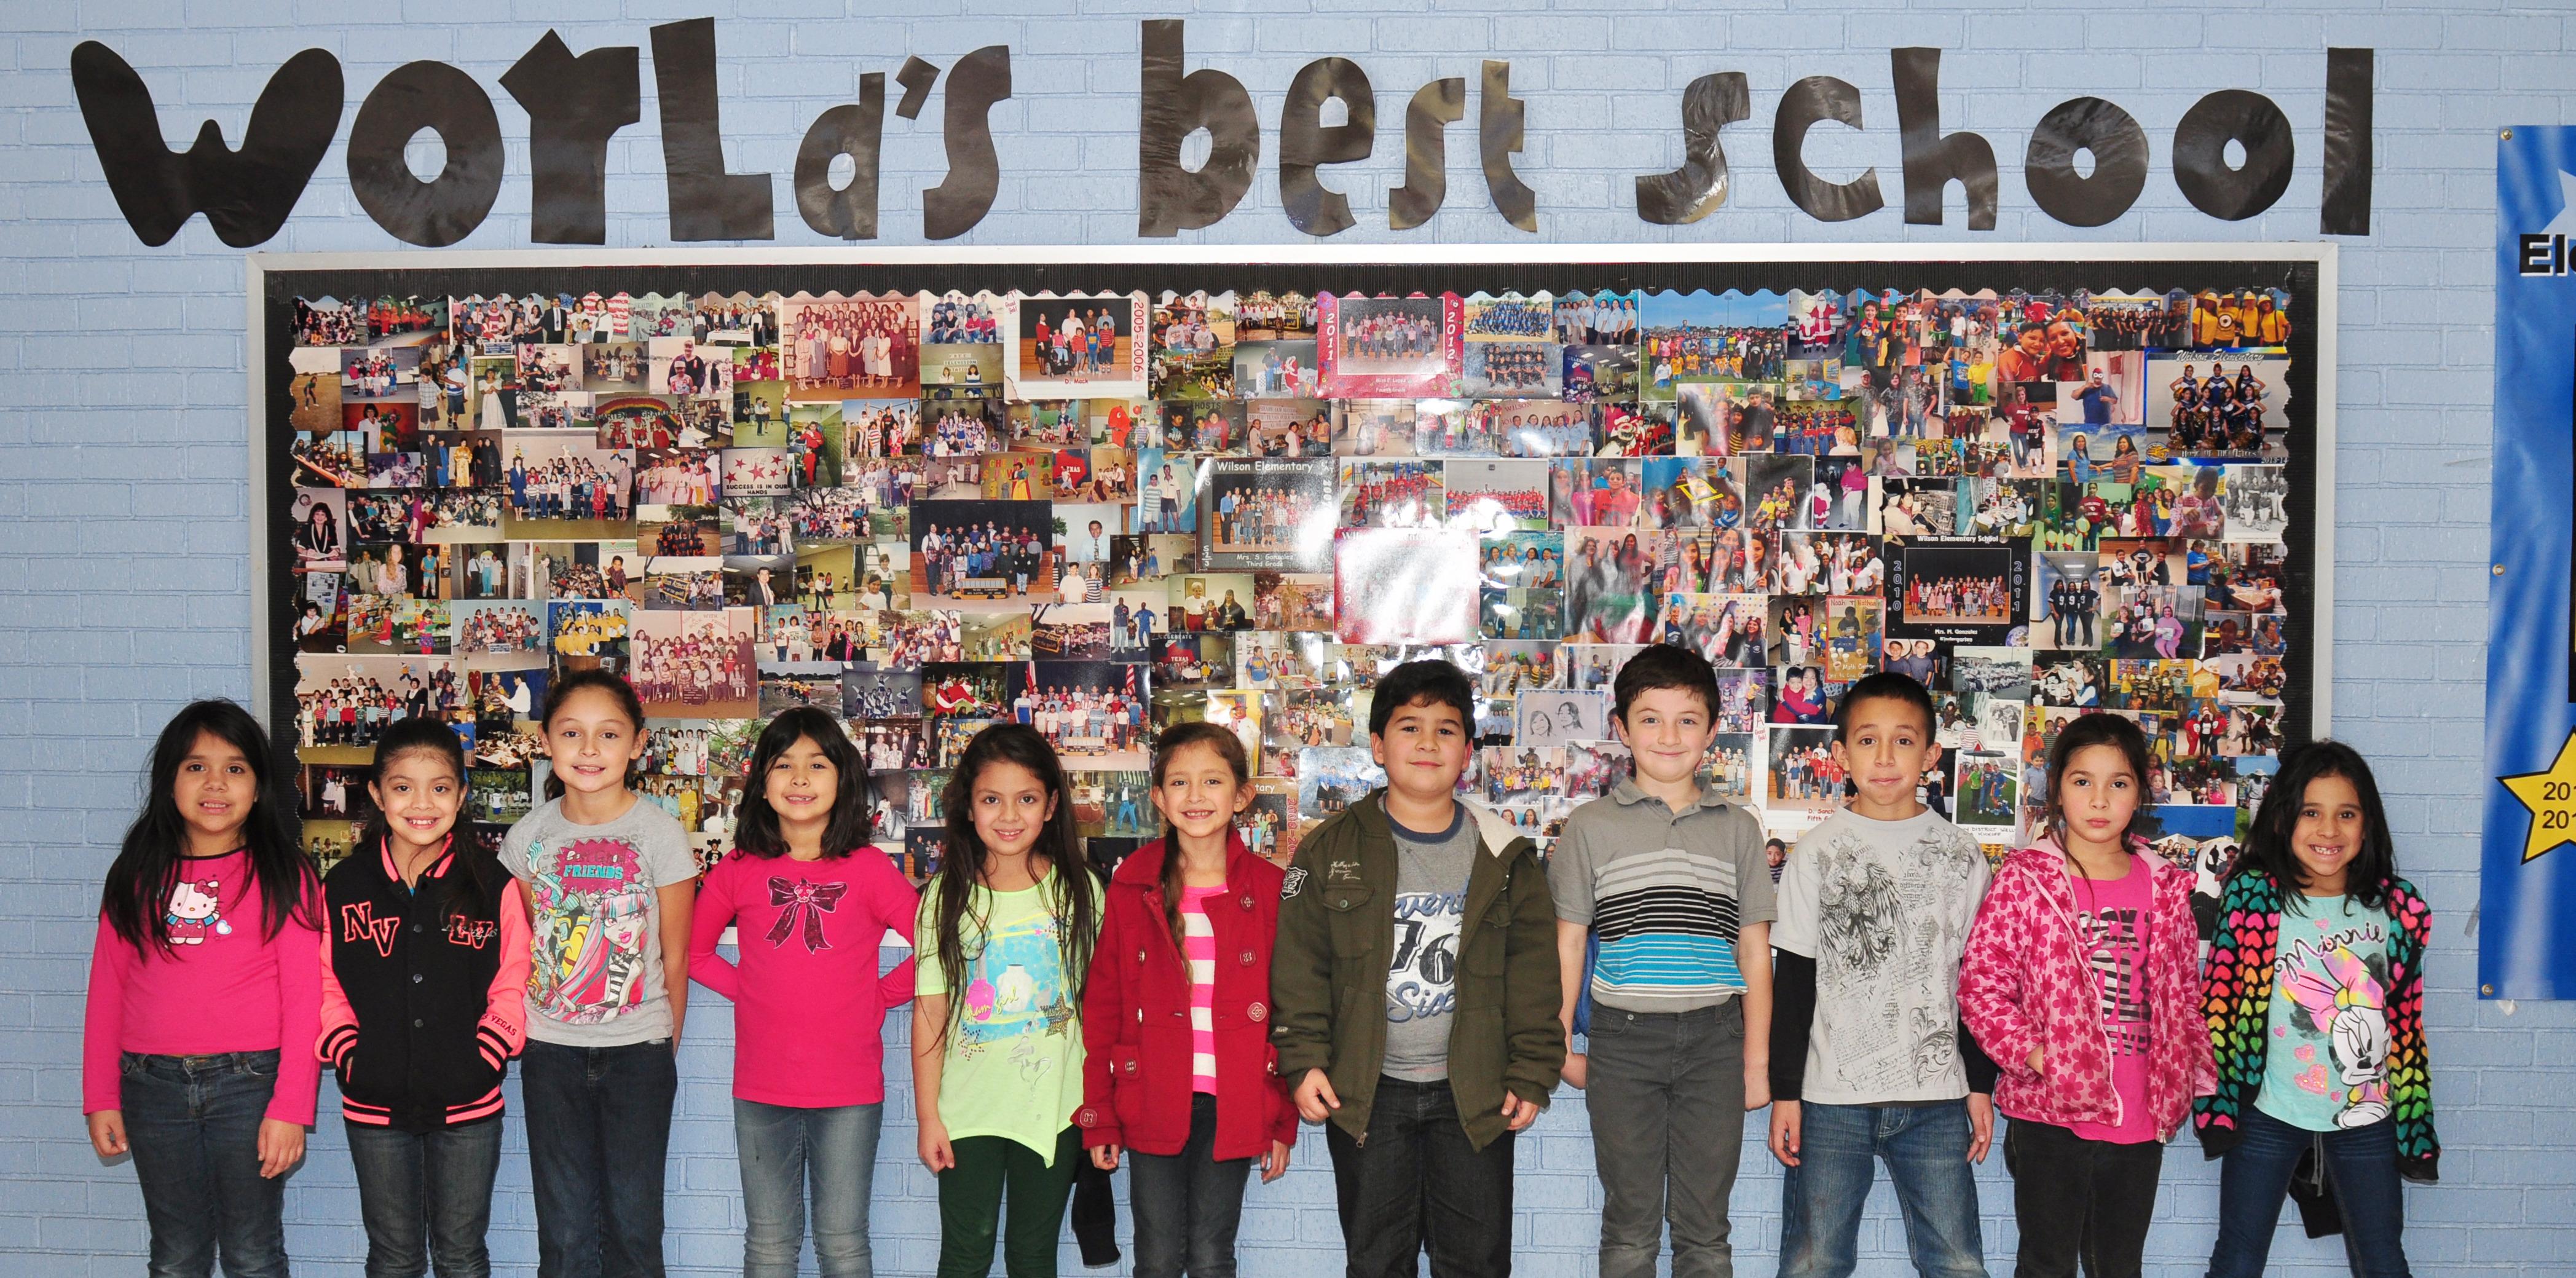 Wilson Elementary celebrates 100 years